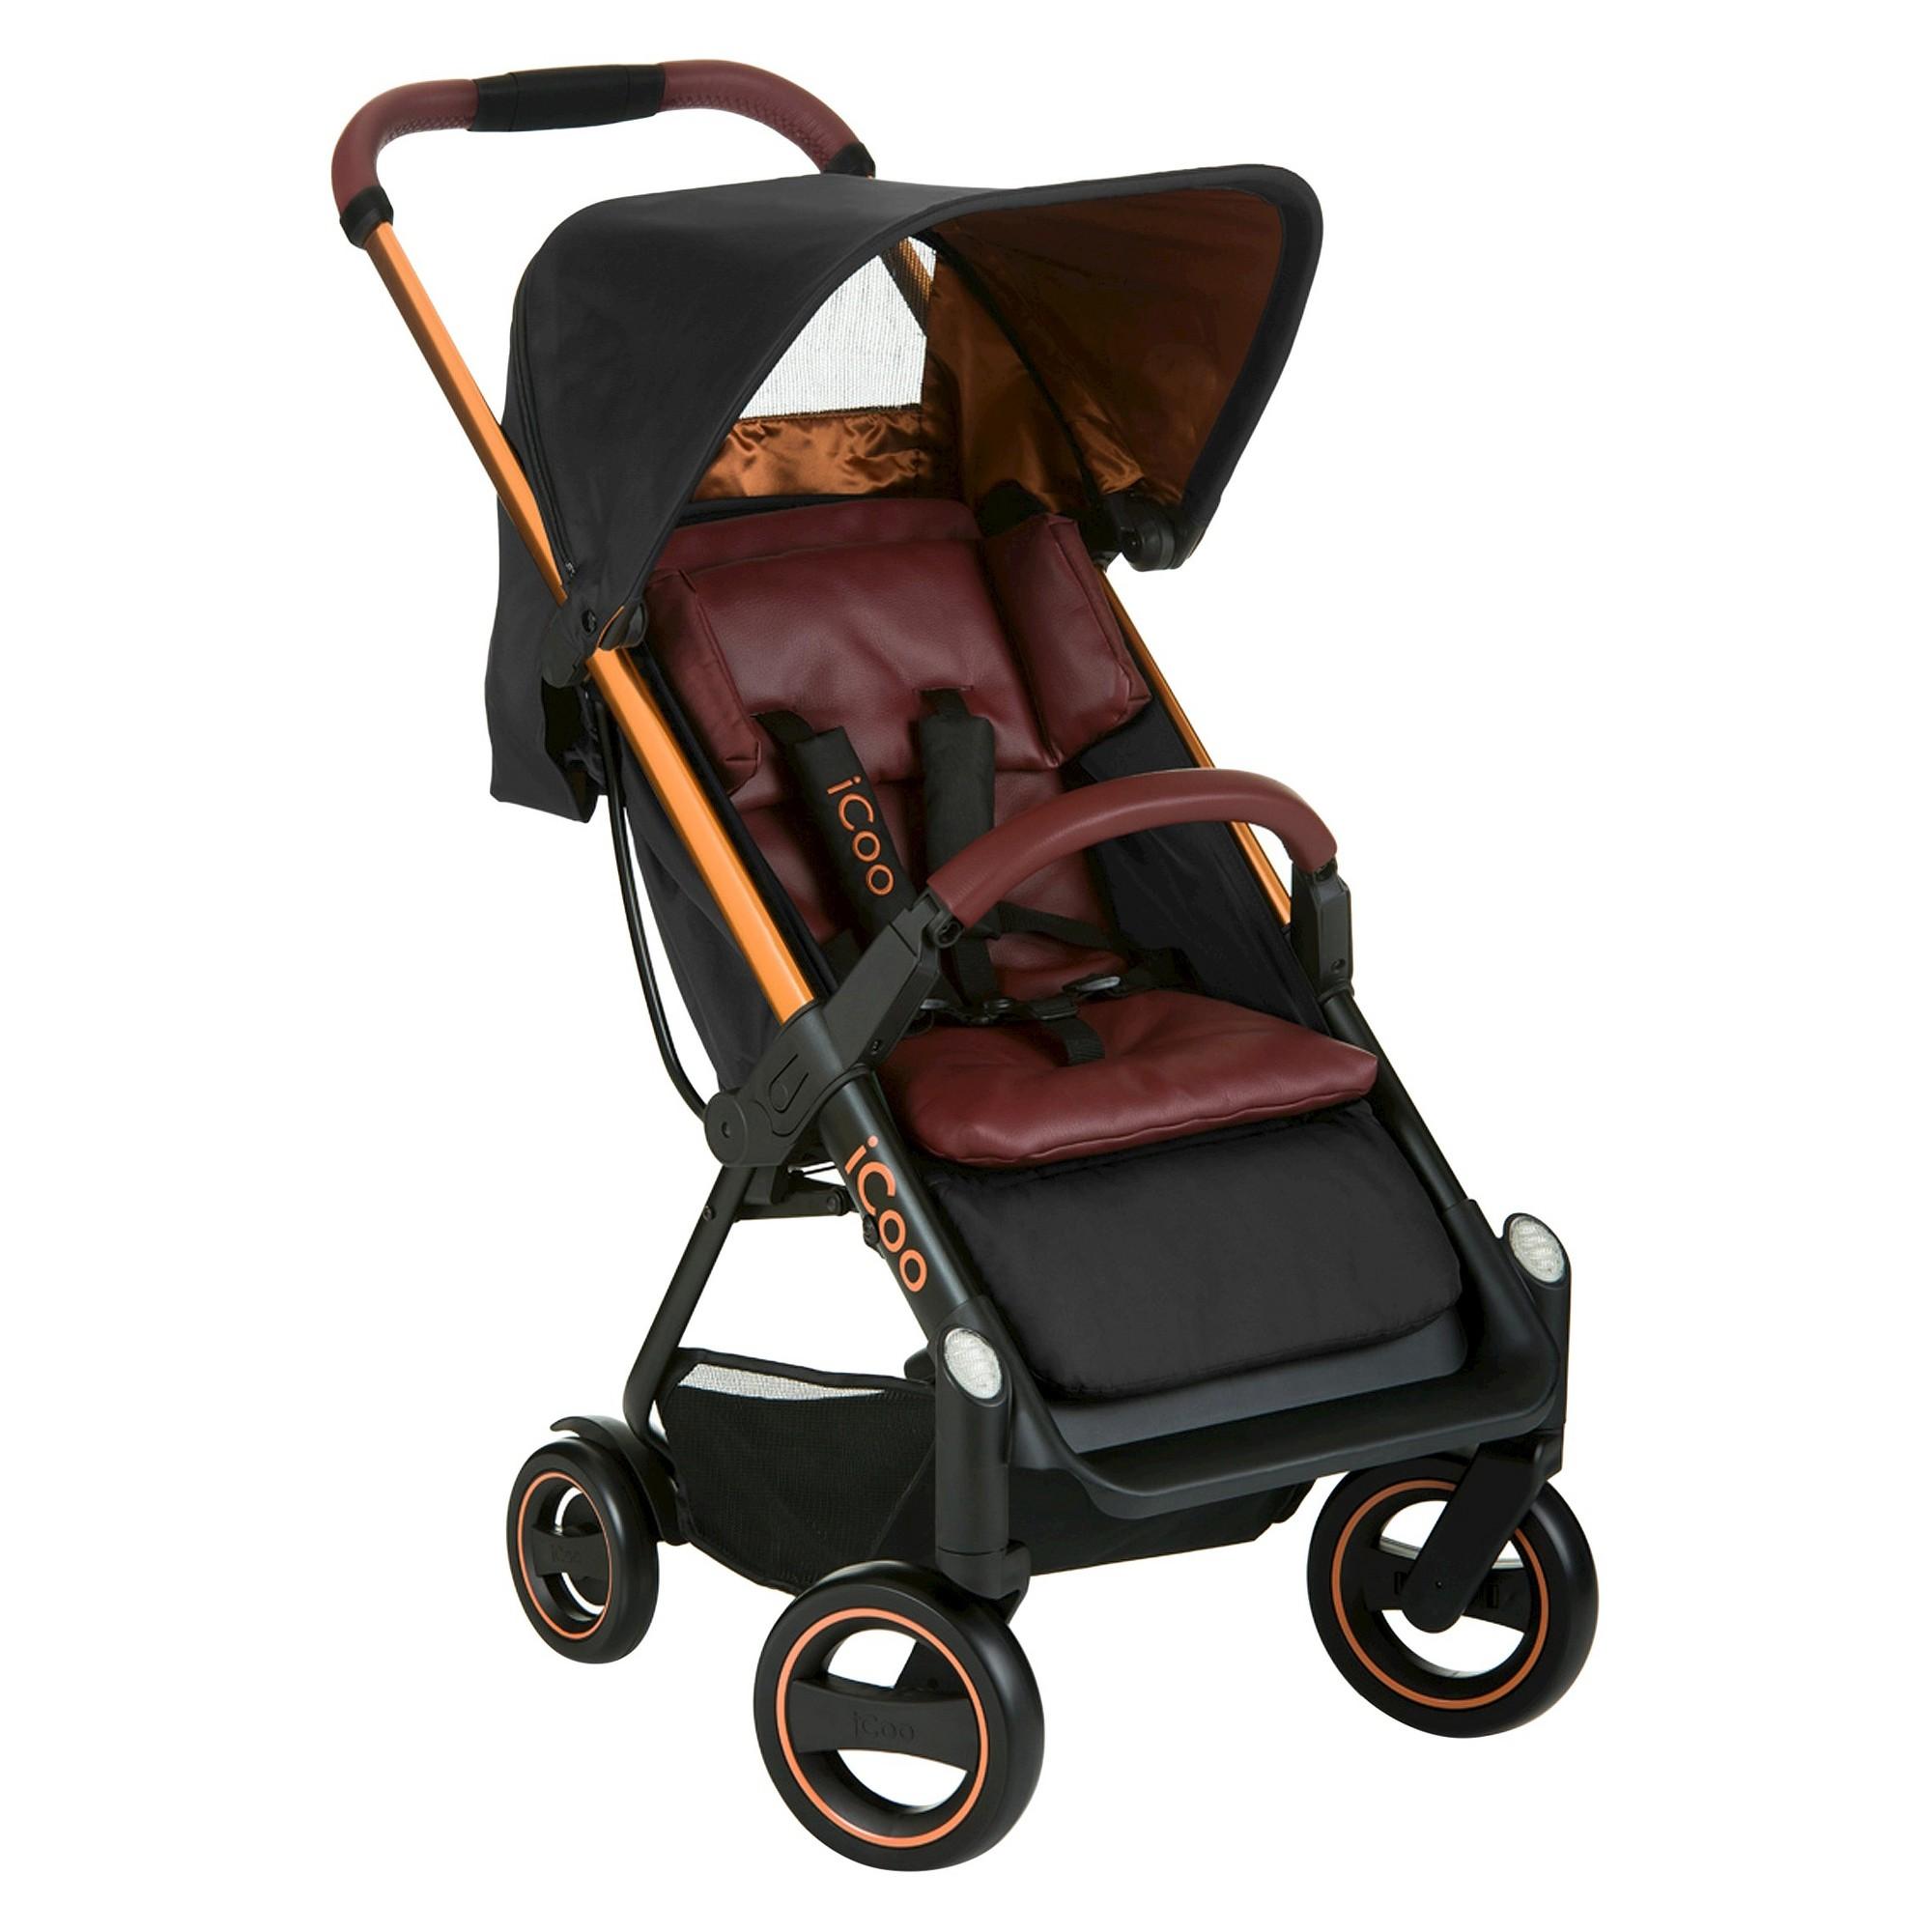 iCoo Acrobat + iGuard 35 Infant Seat Copper Black Best